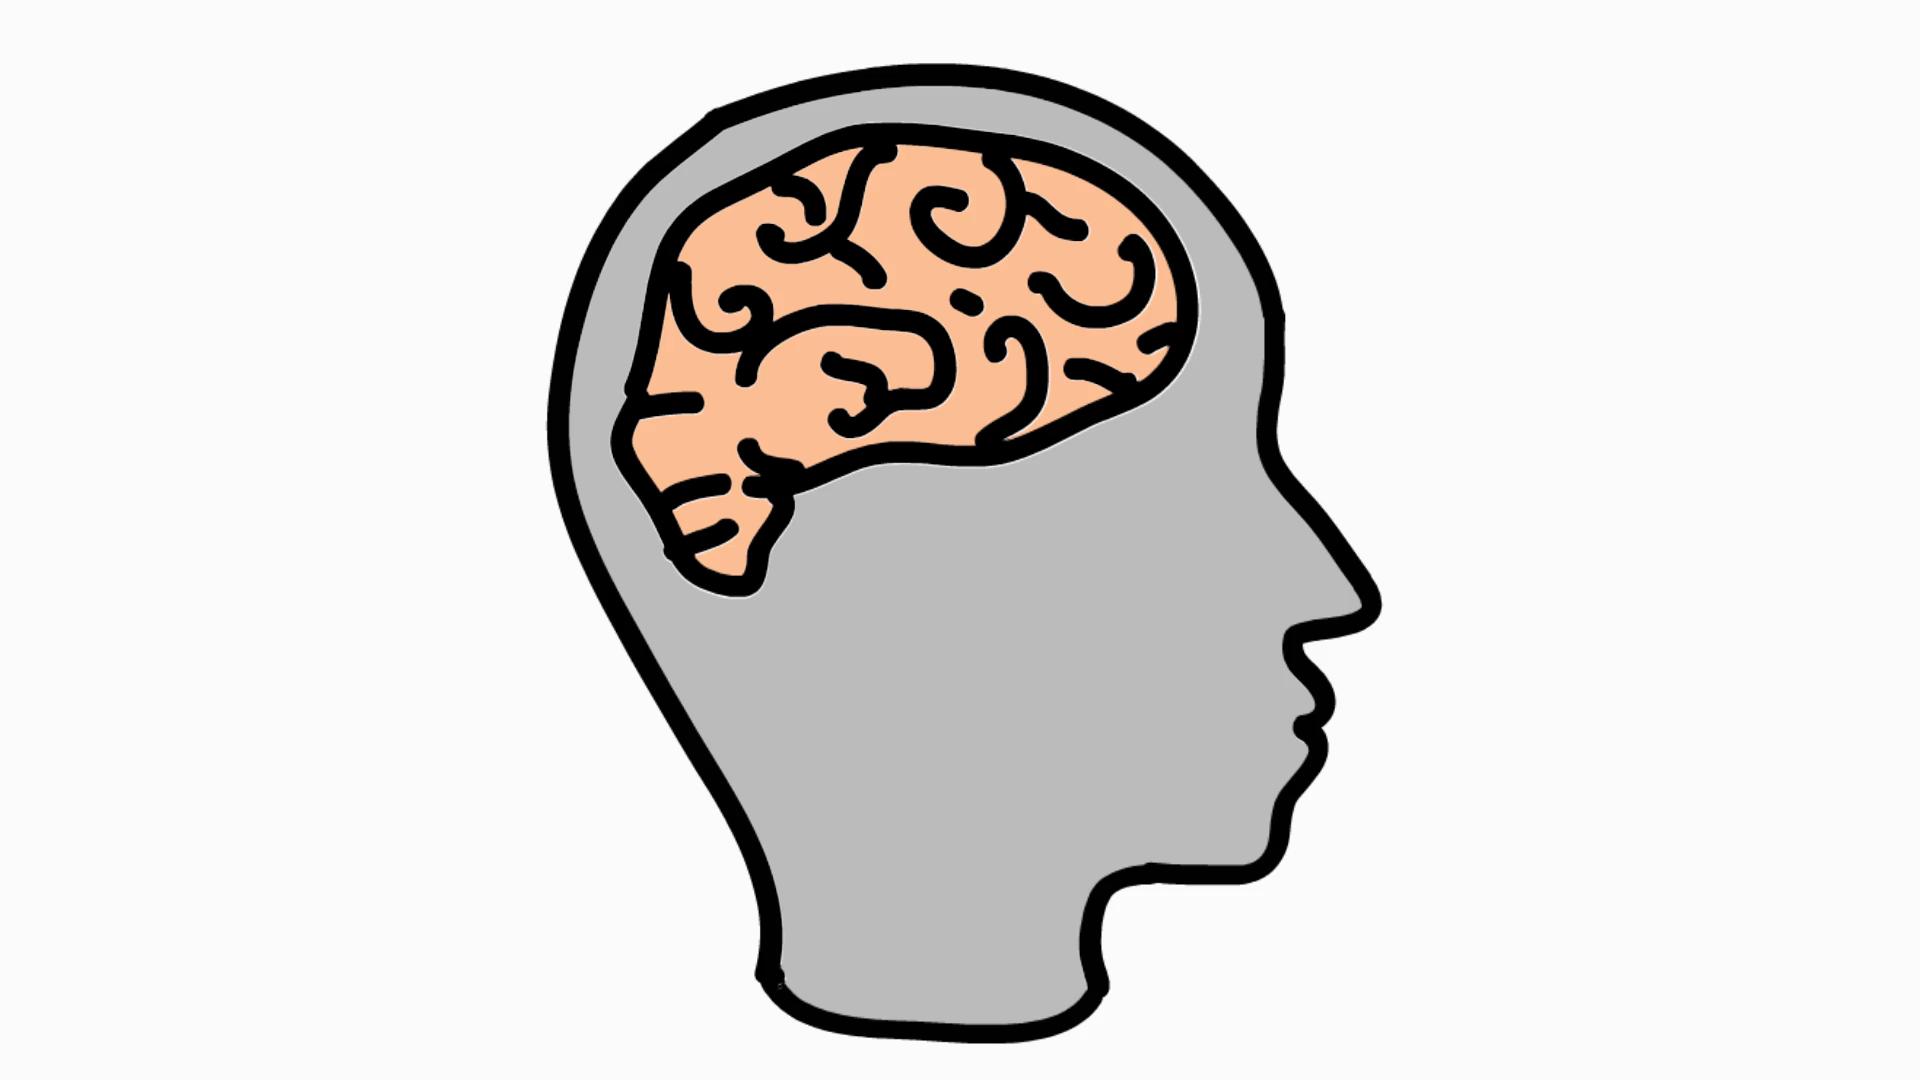 Human Brain Cartoon Illustration Hand Drawn Animation Transparent Motion Background Storyblocks